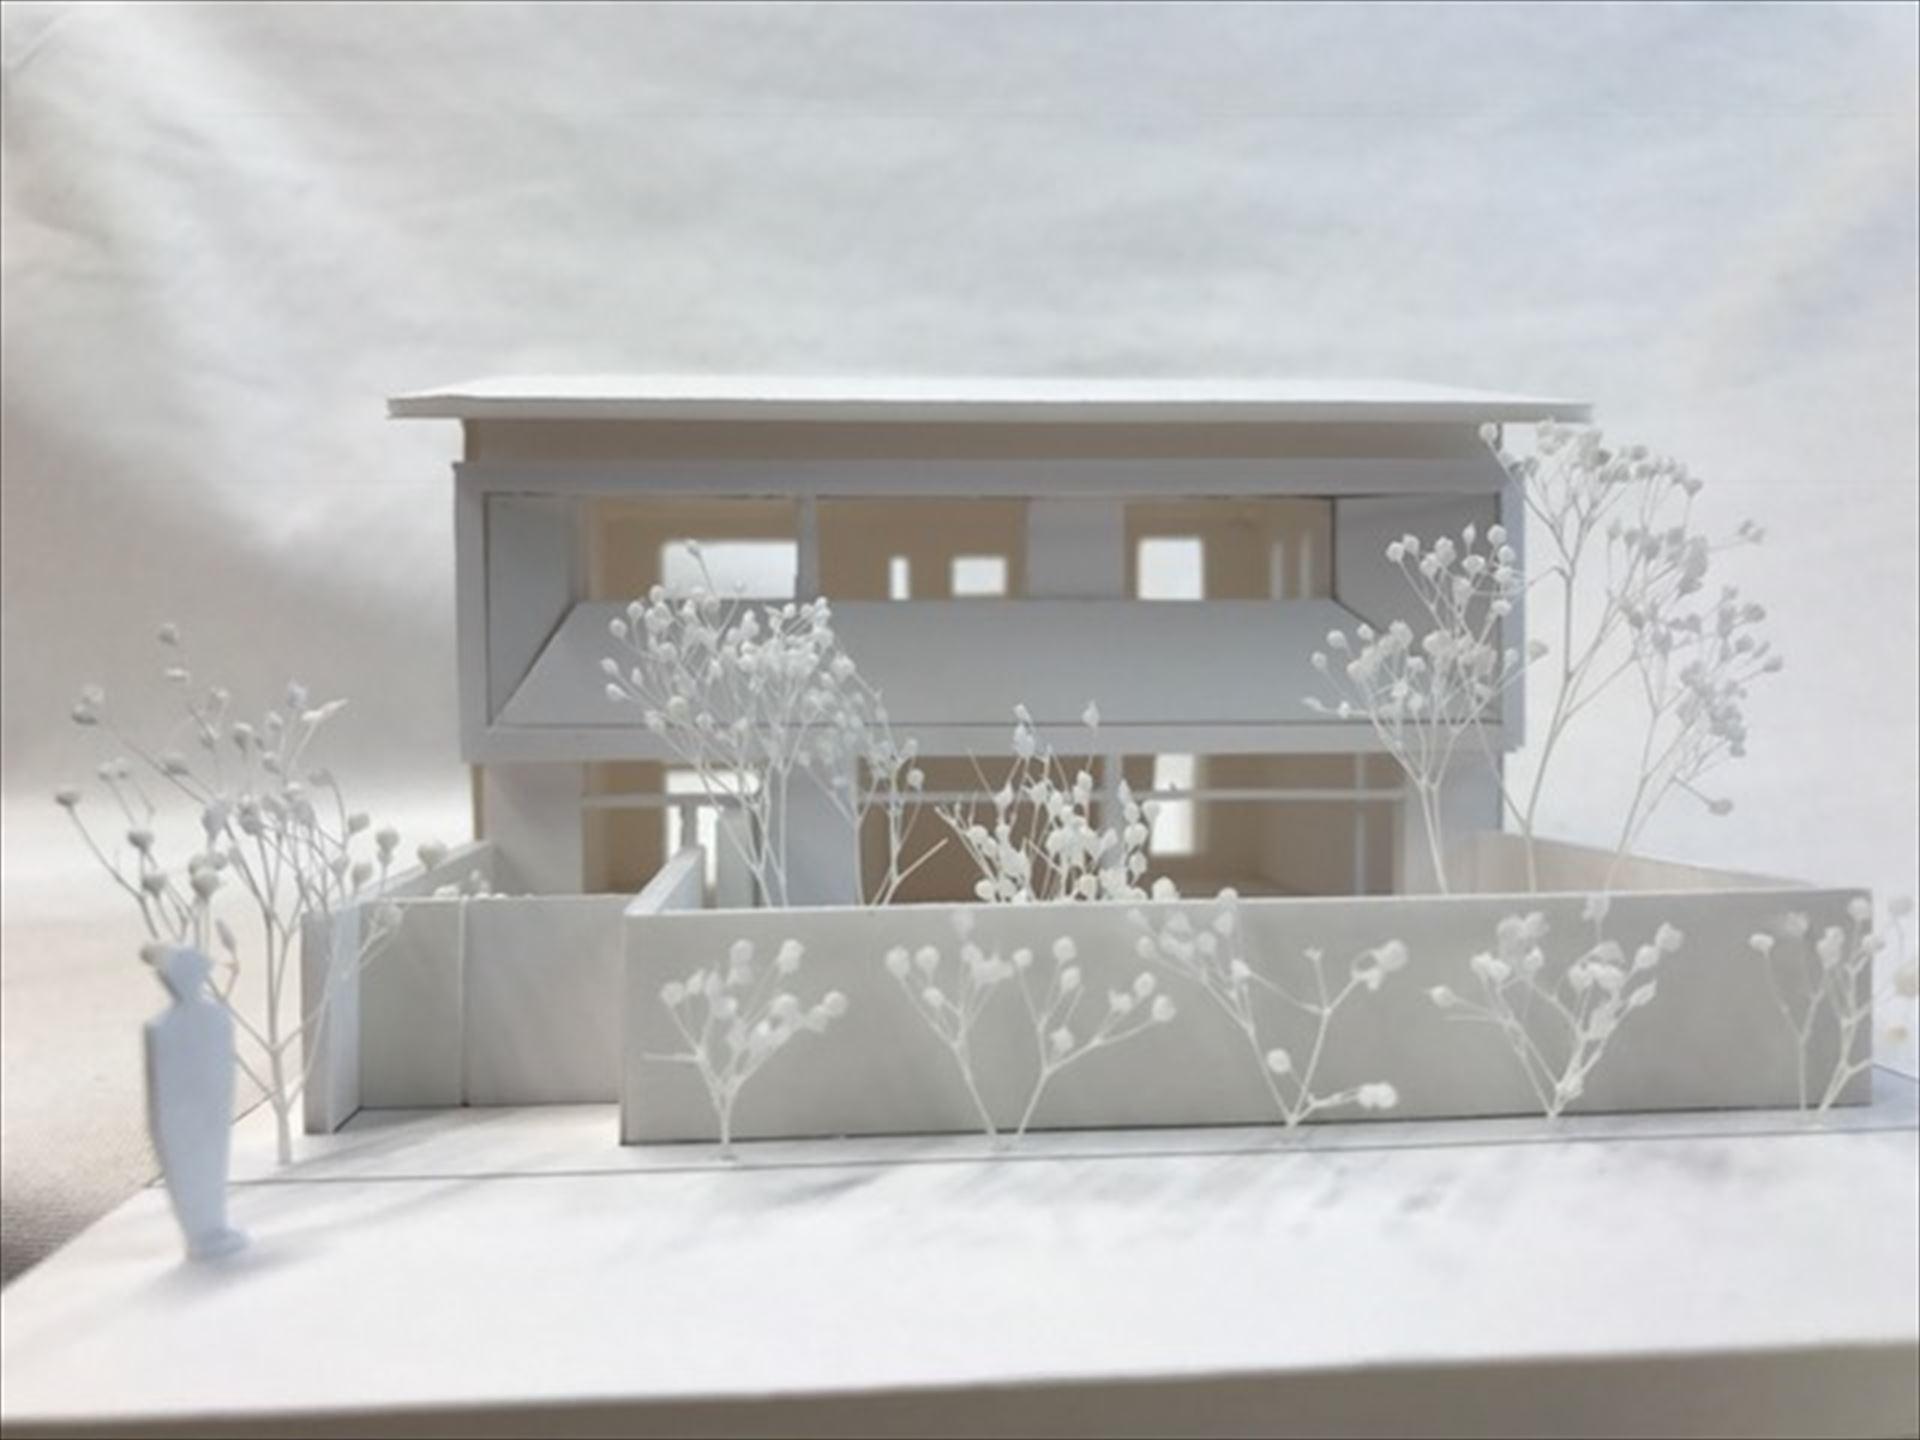 中国張家港市 「張家港の家」 木の家 実施設計完了